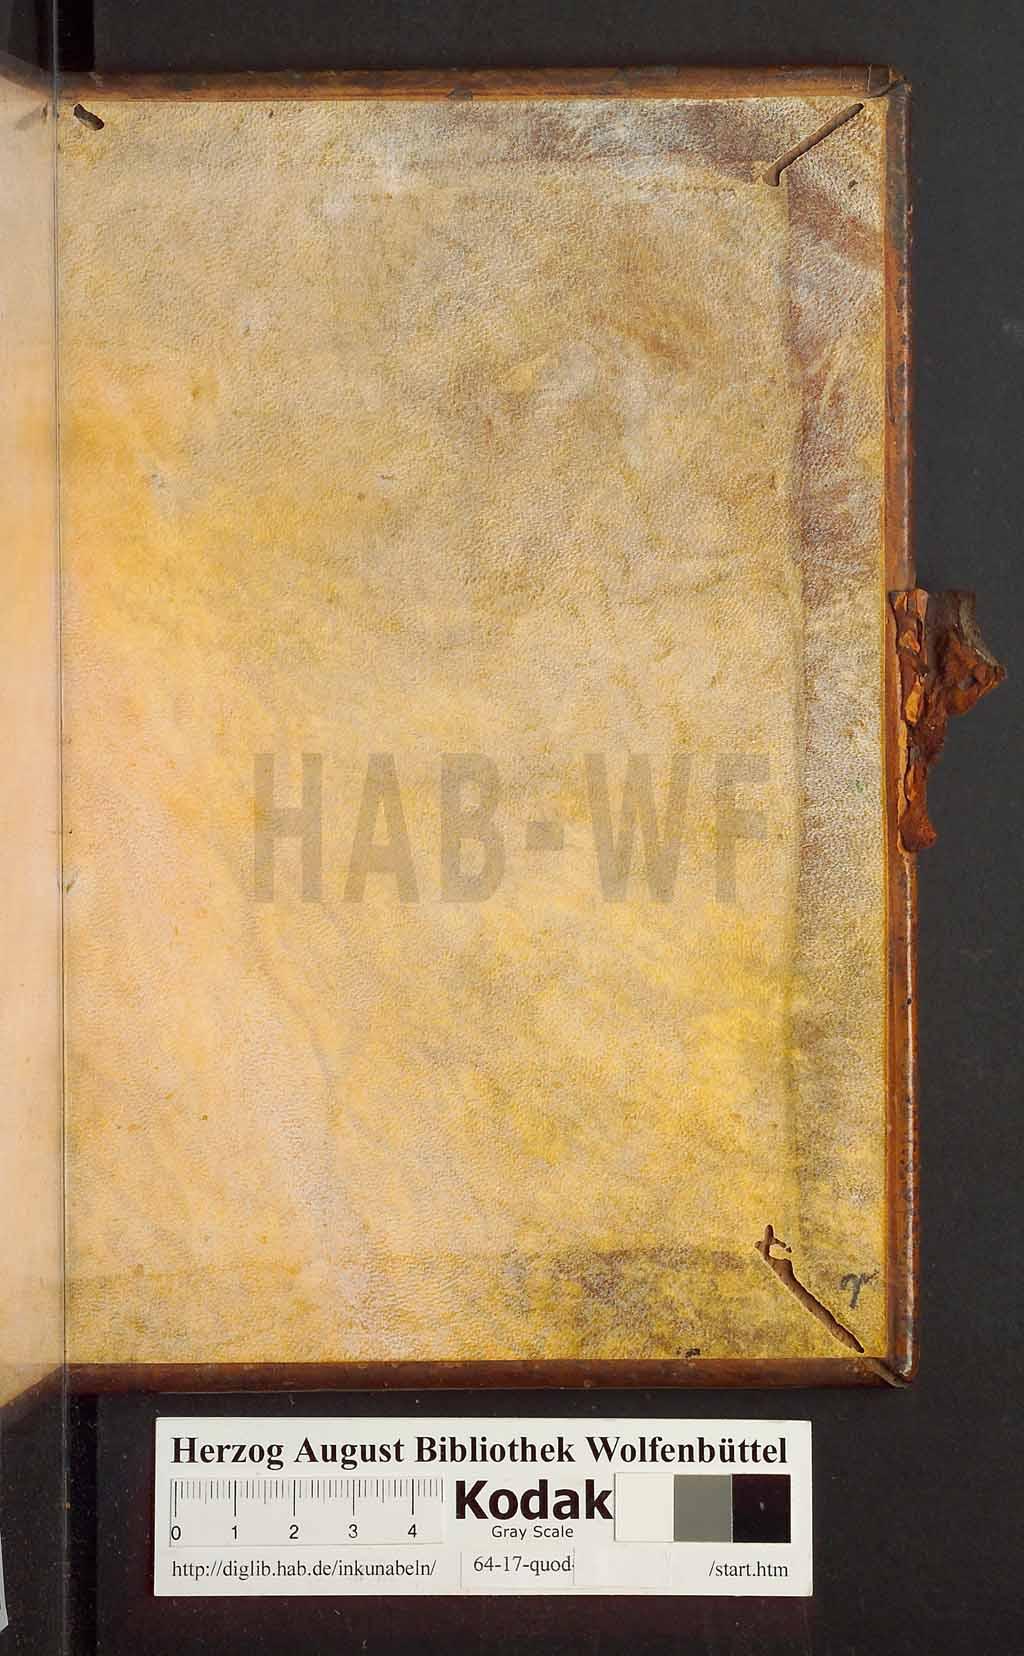 http://diglib.hab.de/inkunabeln/64-17-quod-6/eb03.jpg